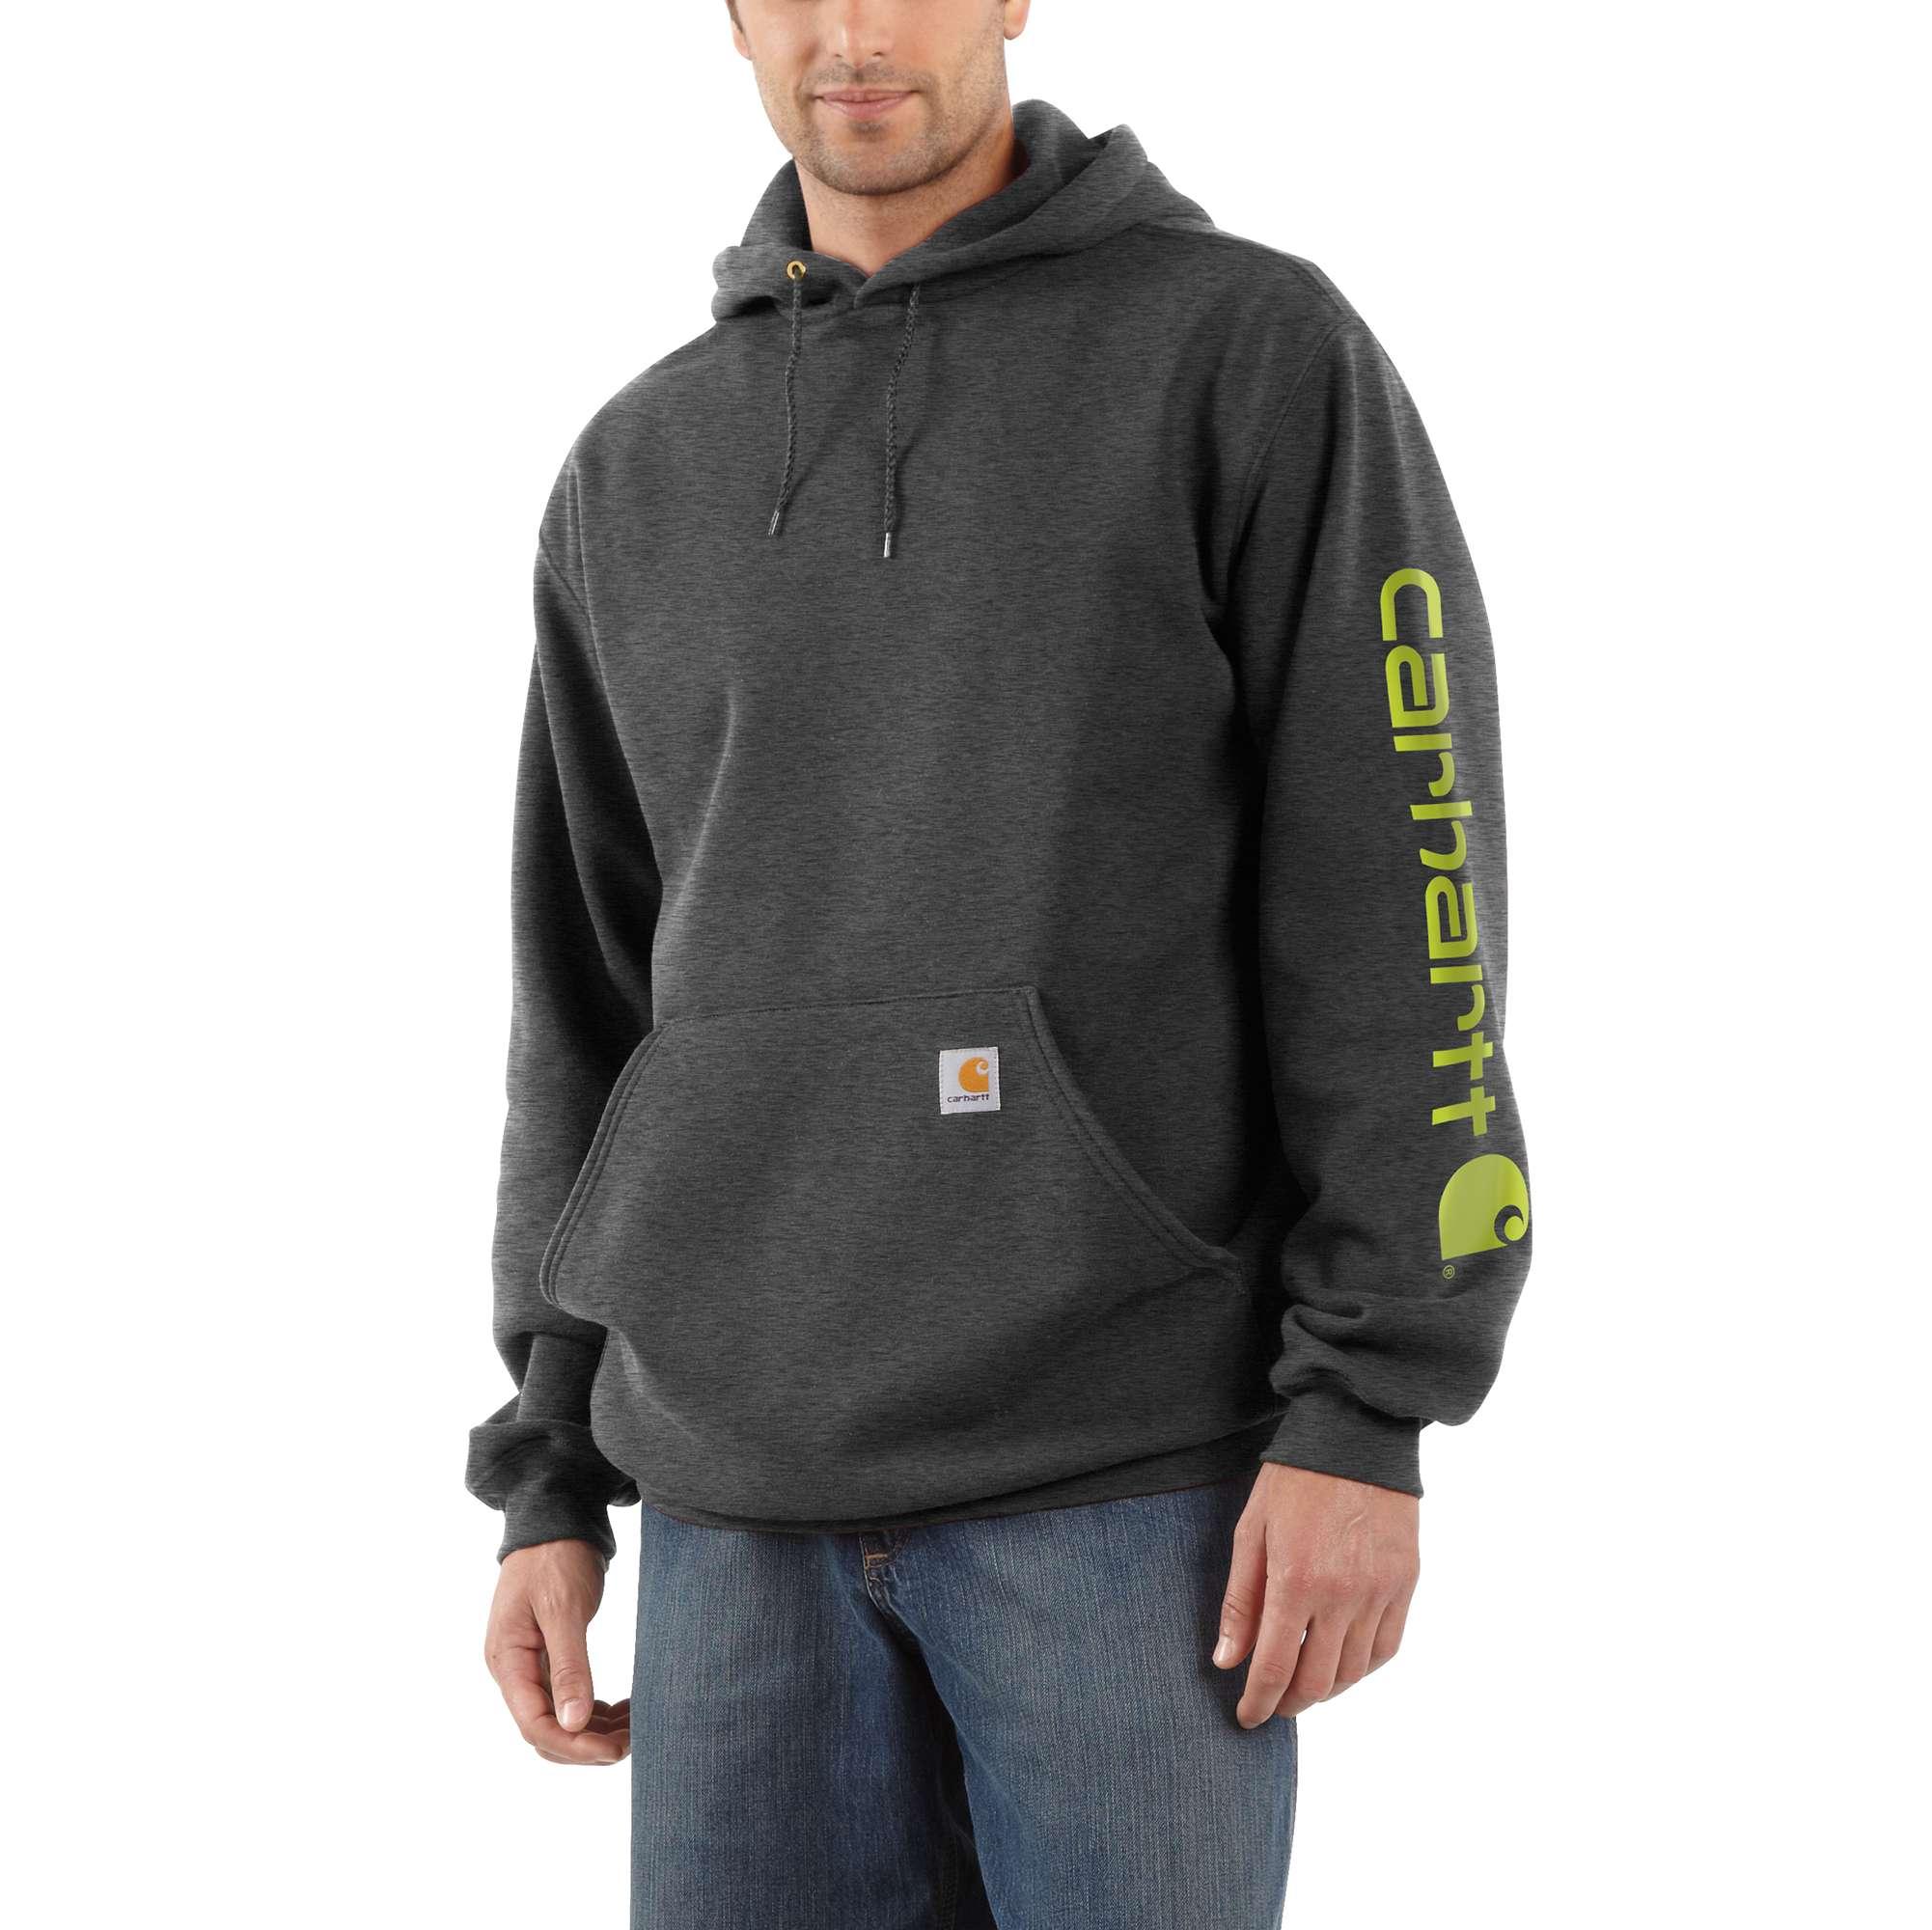 Men's Midweight Signature Logo Sleeve Hooded Sweatshirt, Gray, swatch